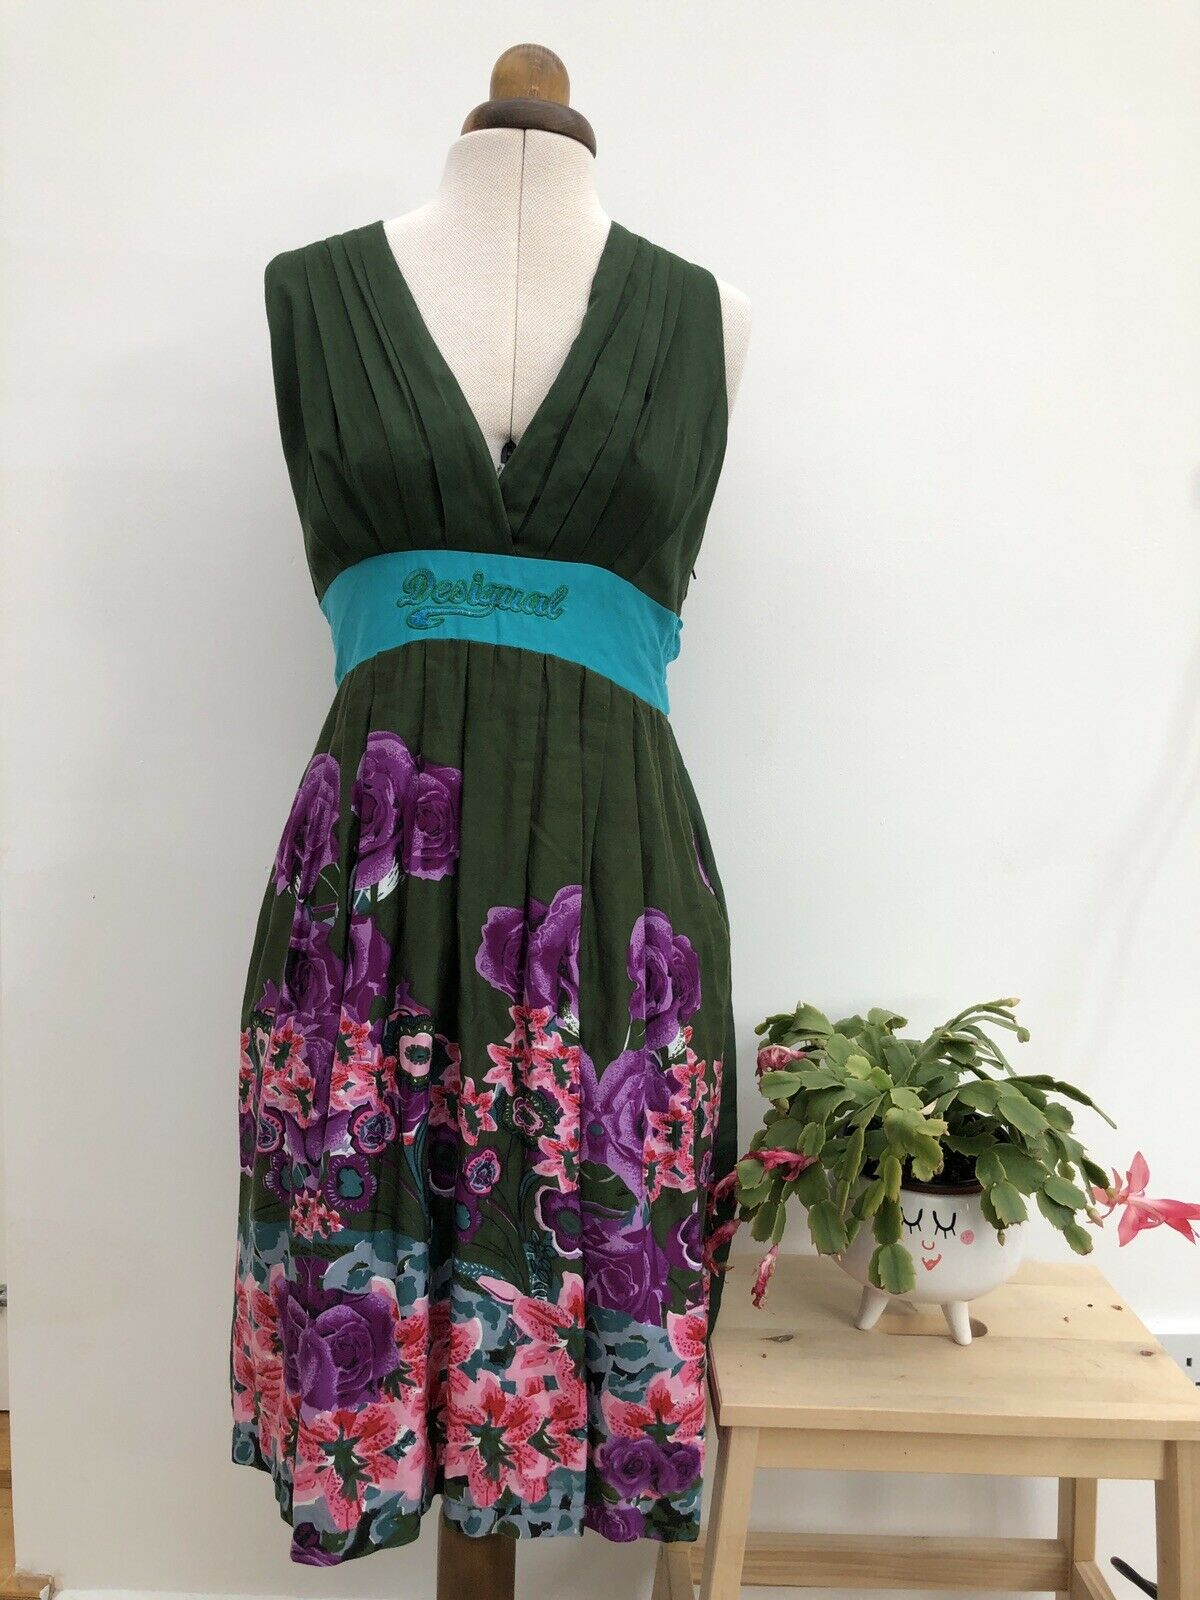 Stunning Desigual Halter Neck Grün Floral Summer Dress Größe Large